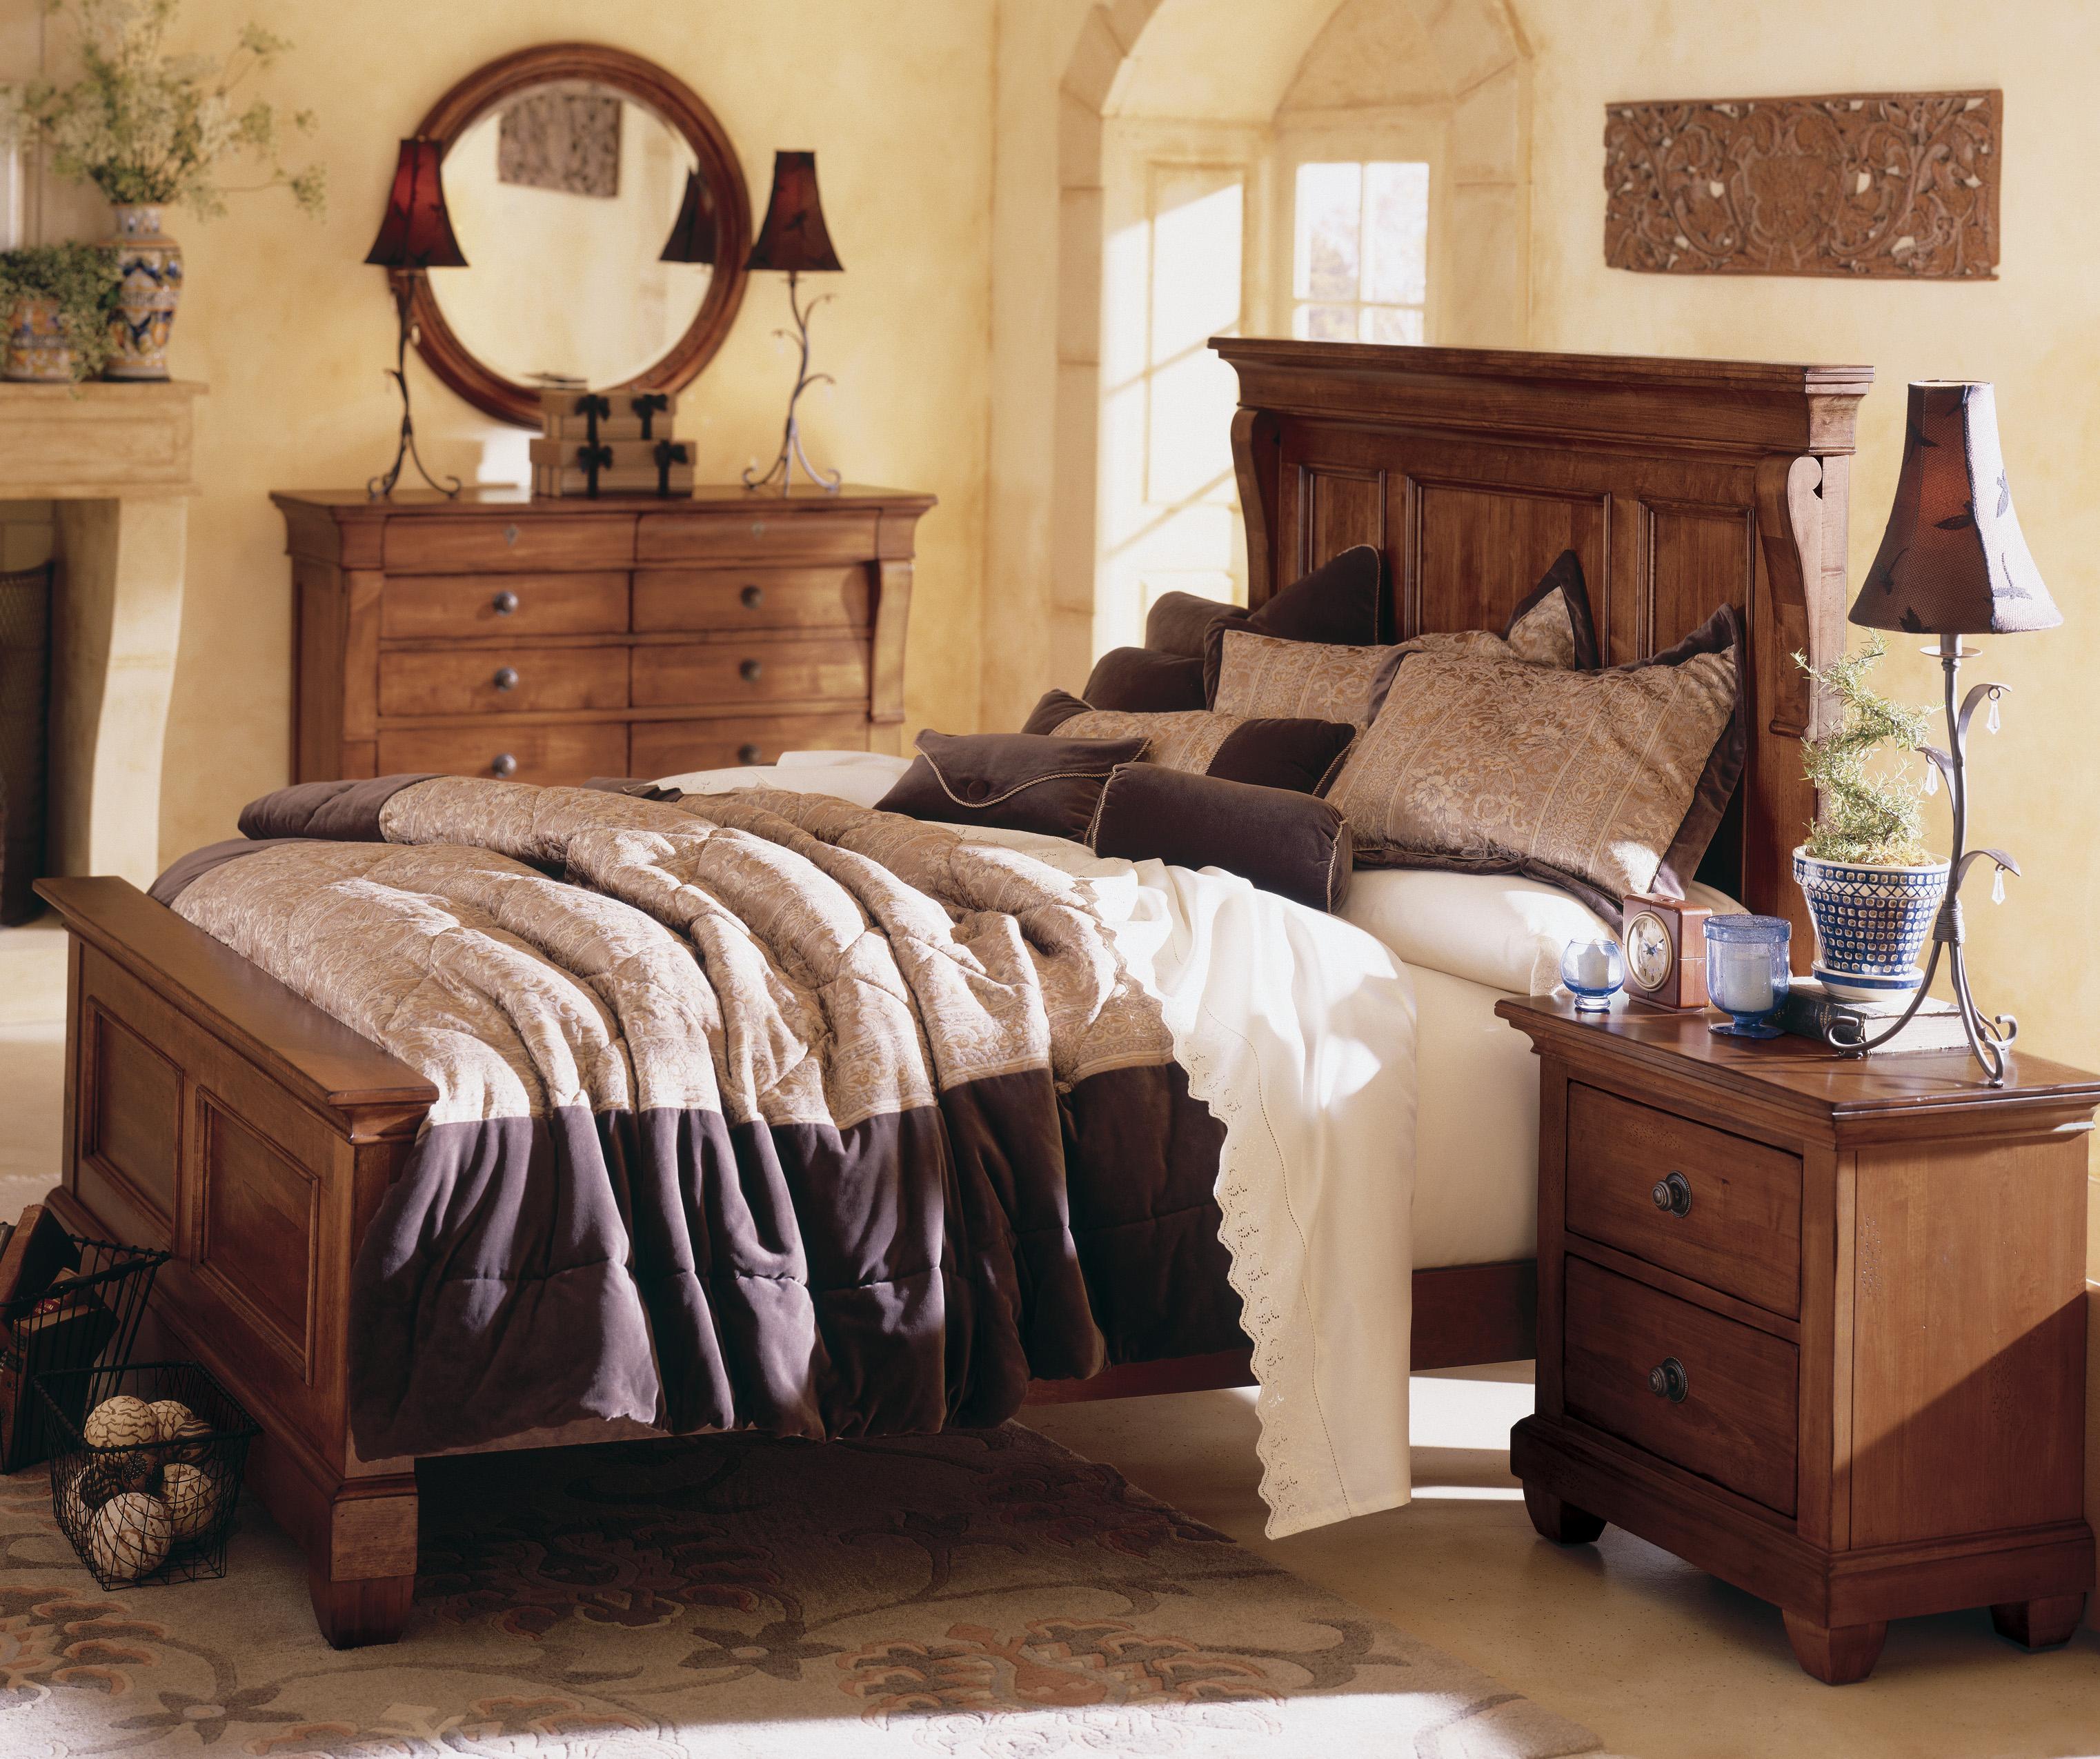 kincaid furniture tuscano drawer dresser solid wood top becker